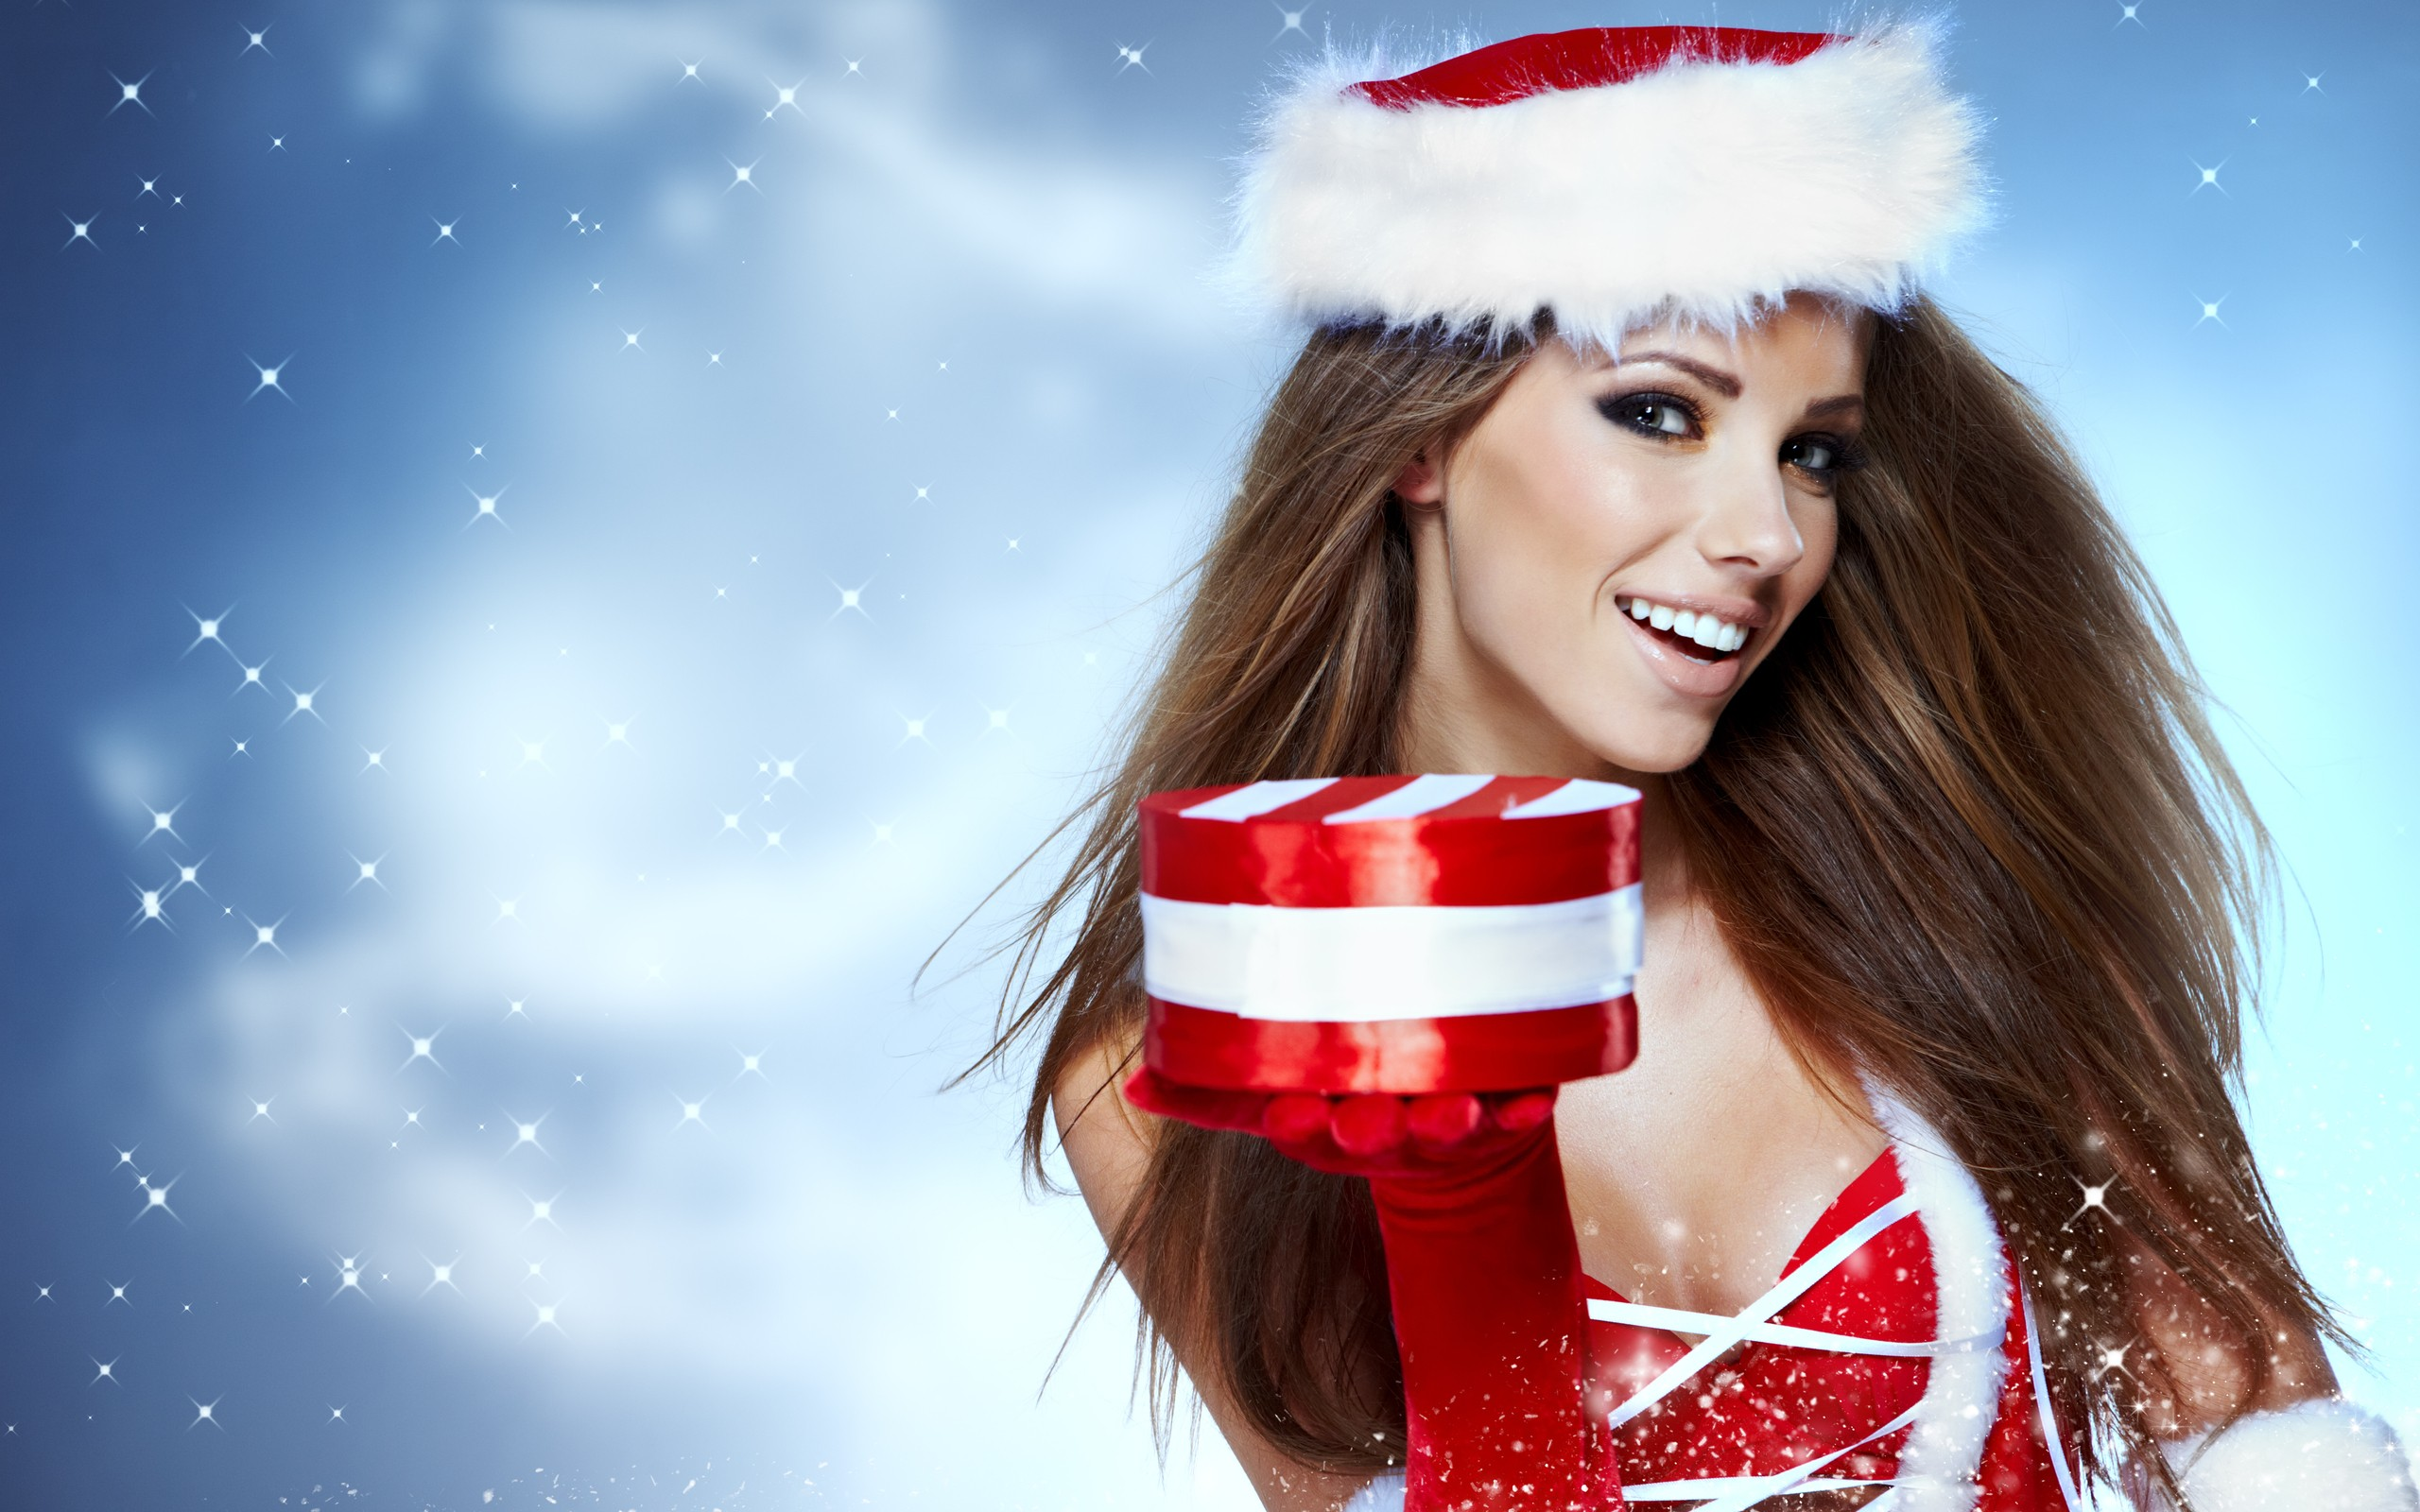 People 2560x1600 Santa girl Santa hats Santa costume smiling brunette long hair model women looking at viewer simple background Izabela Magier